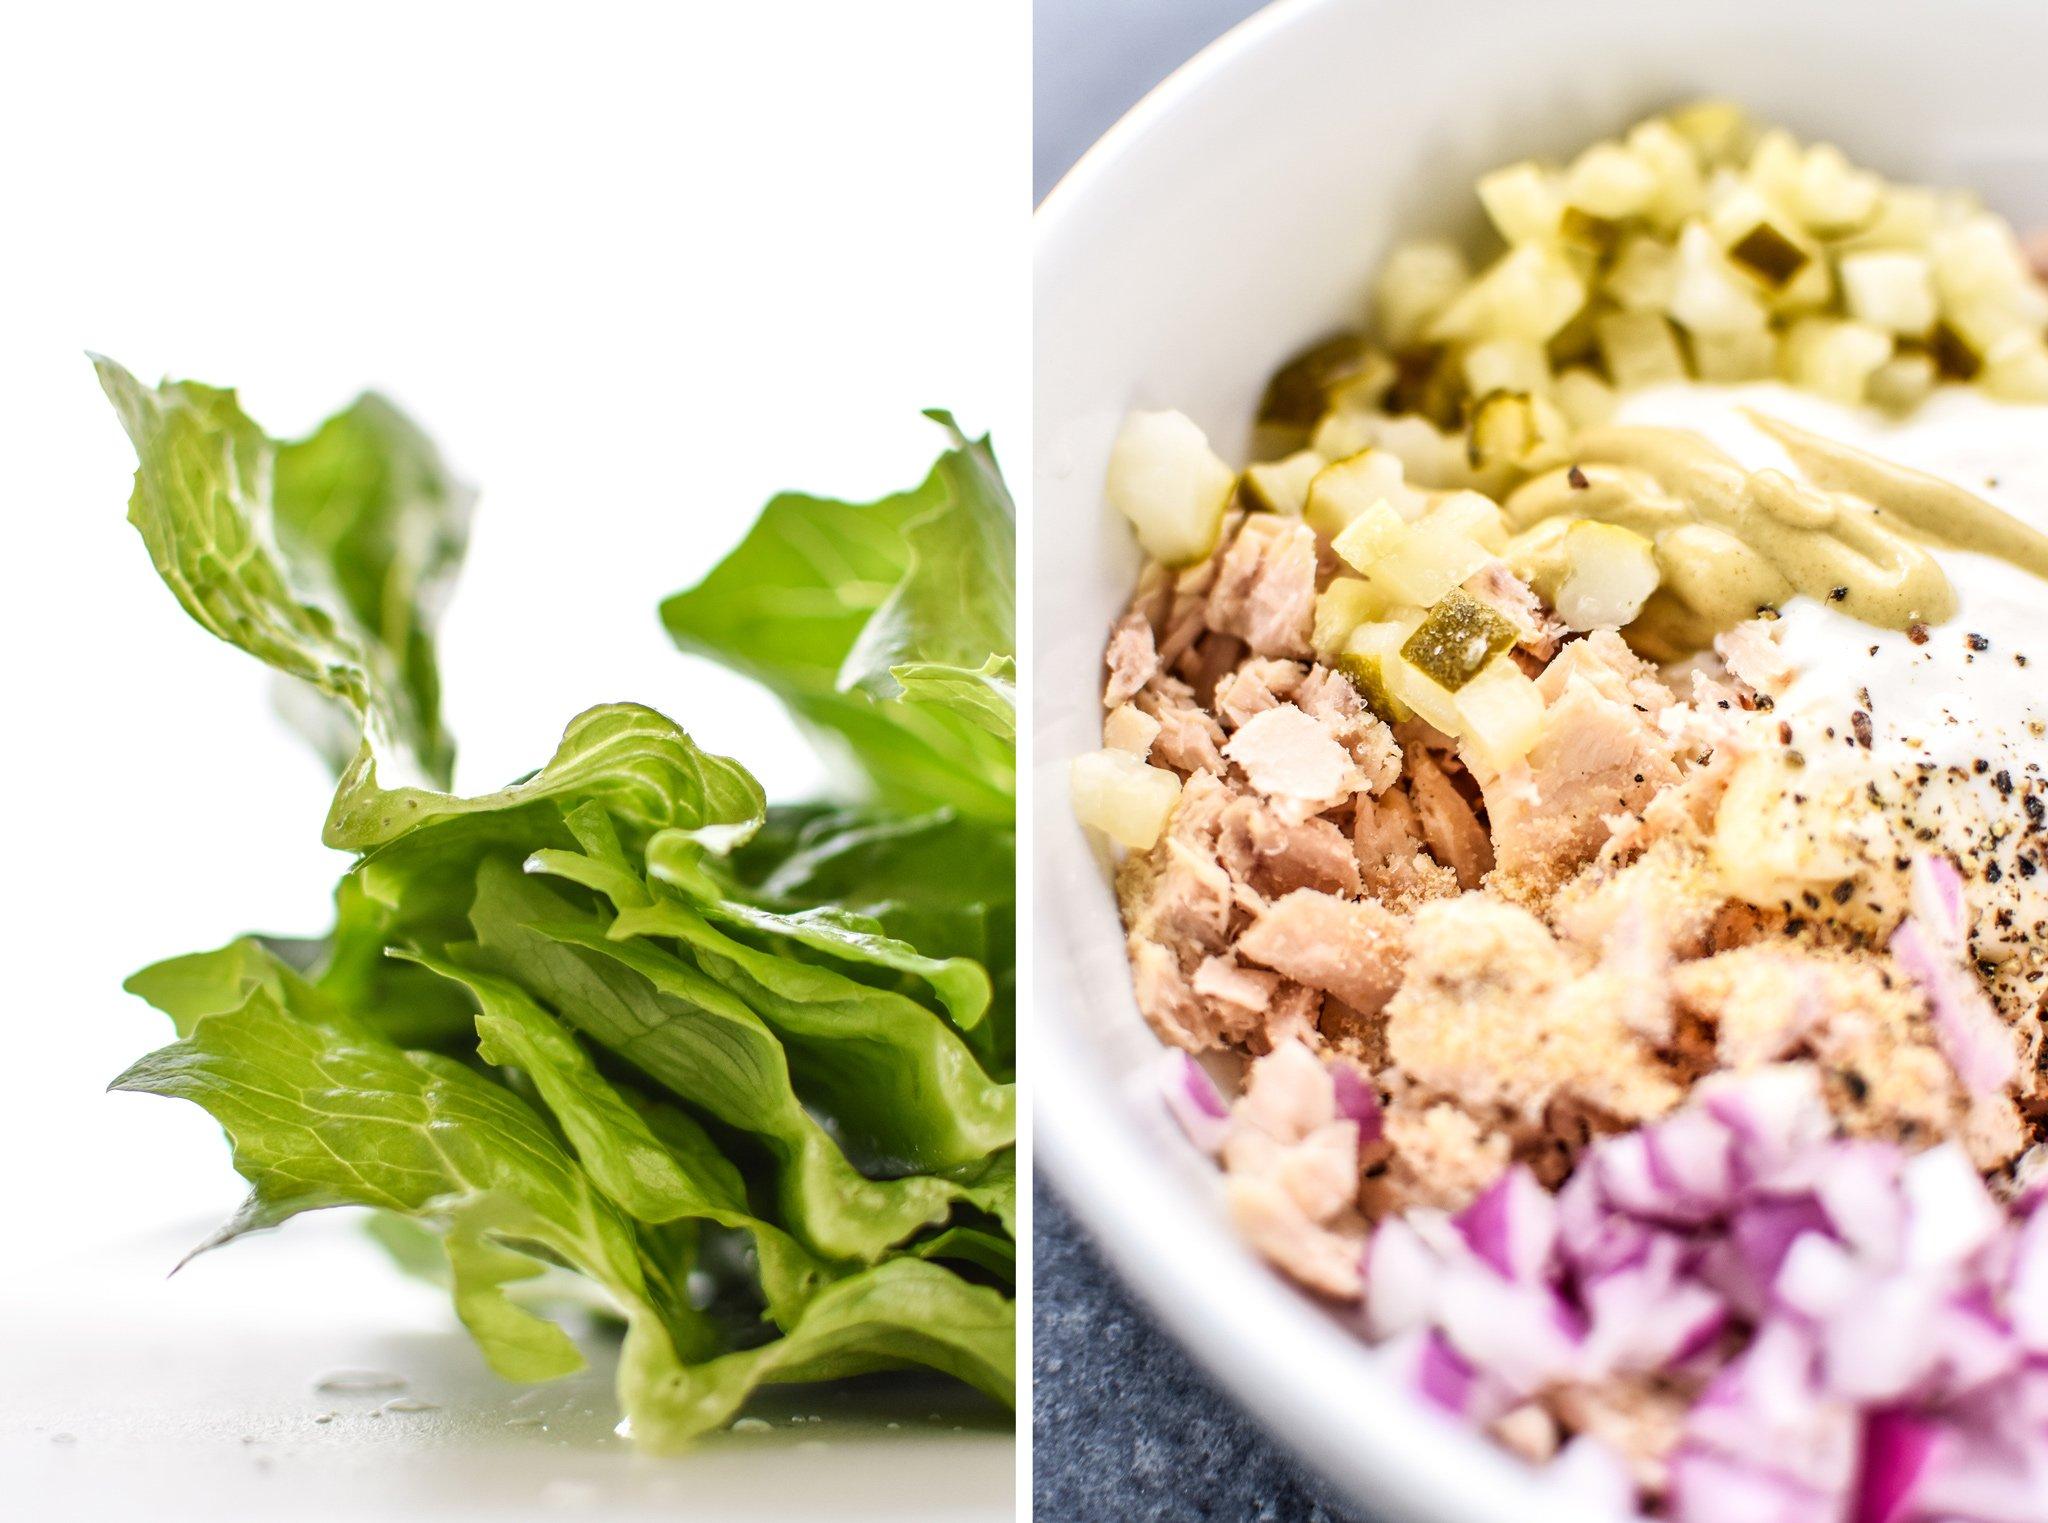 Left: Romaine lettuce laeves. RIght: Tuna Salad Lettuce Wraps Meal prep being prepared.